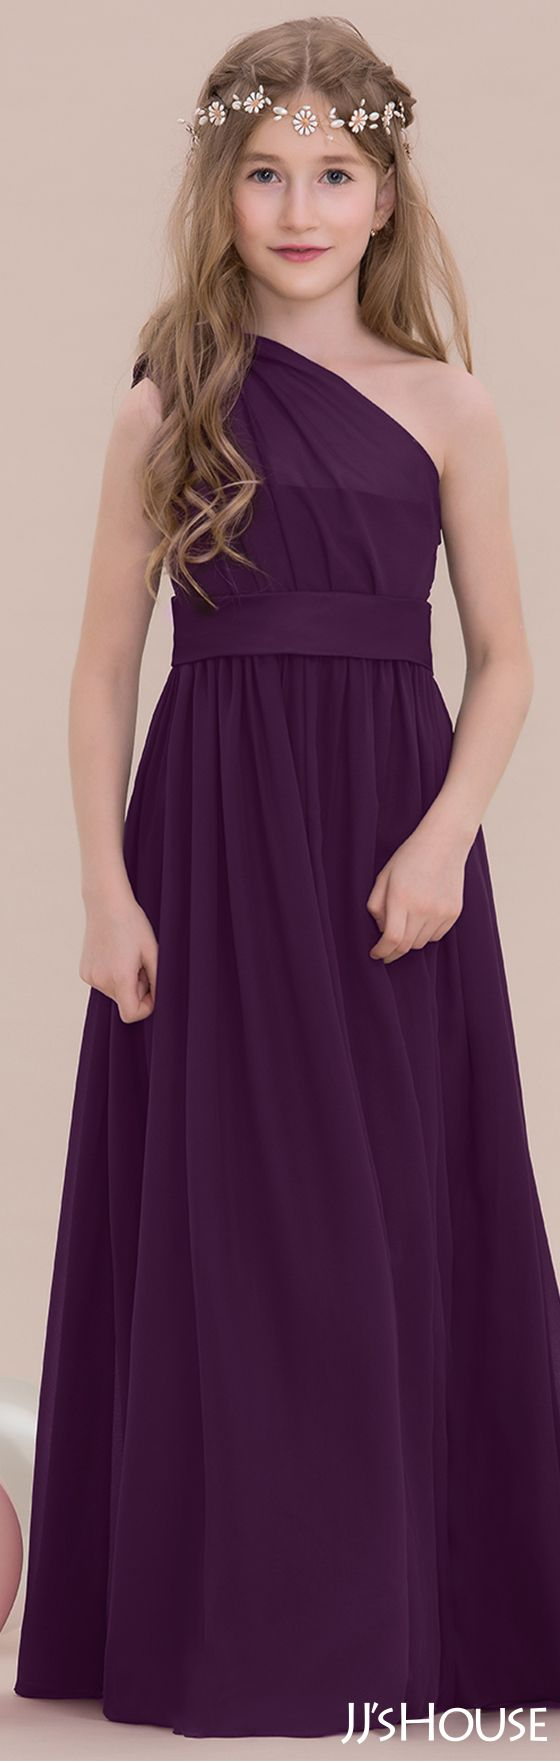 Best 25 junior bridesmaid dresses ideas on pinterest styles of jjshouse junior bridesmaid ombrellifo Gallery